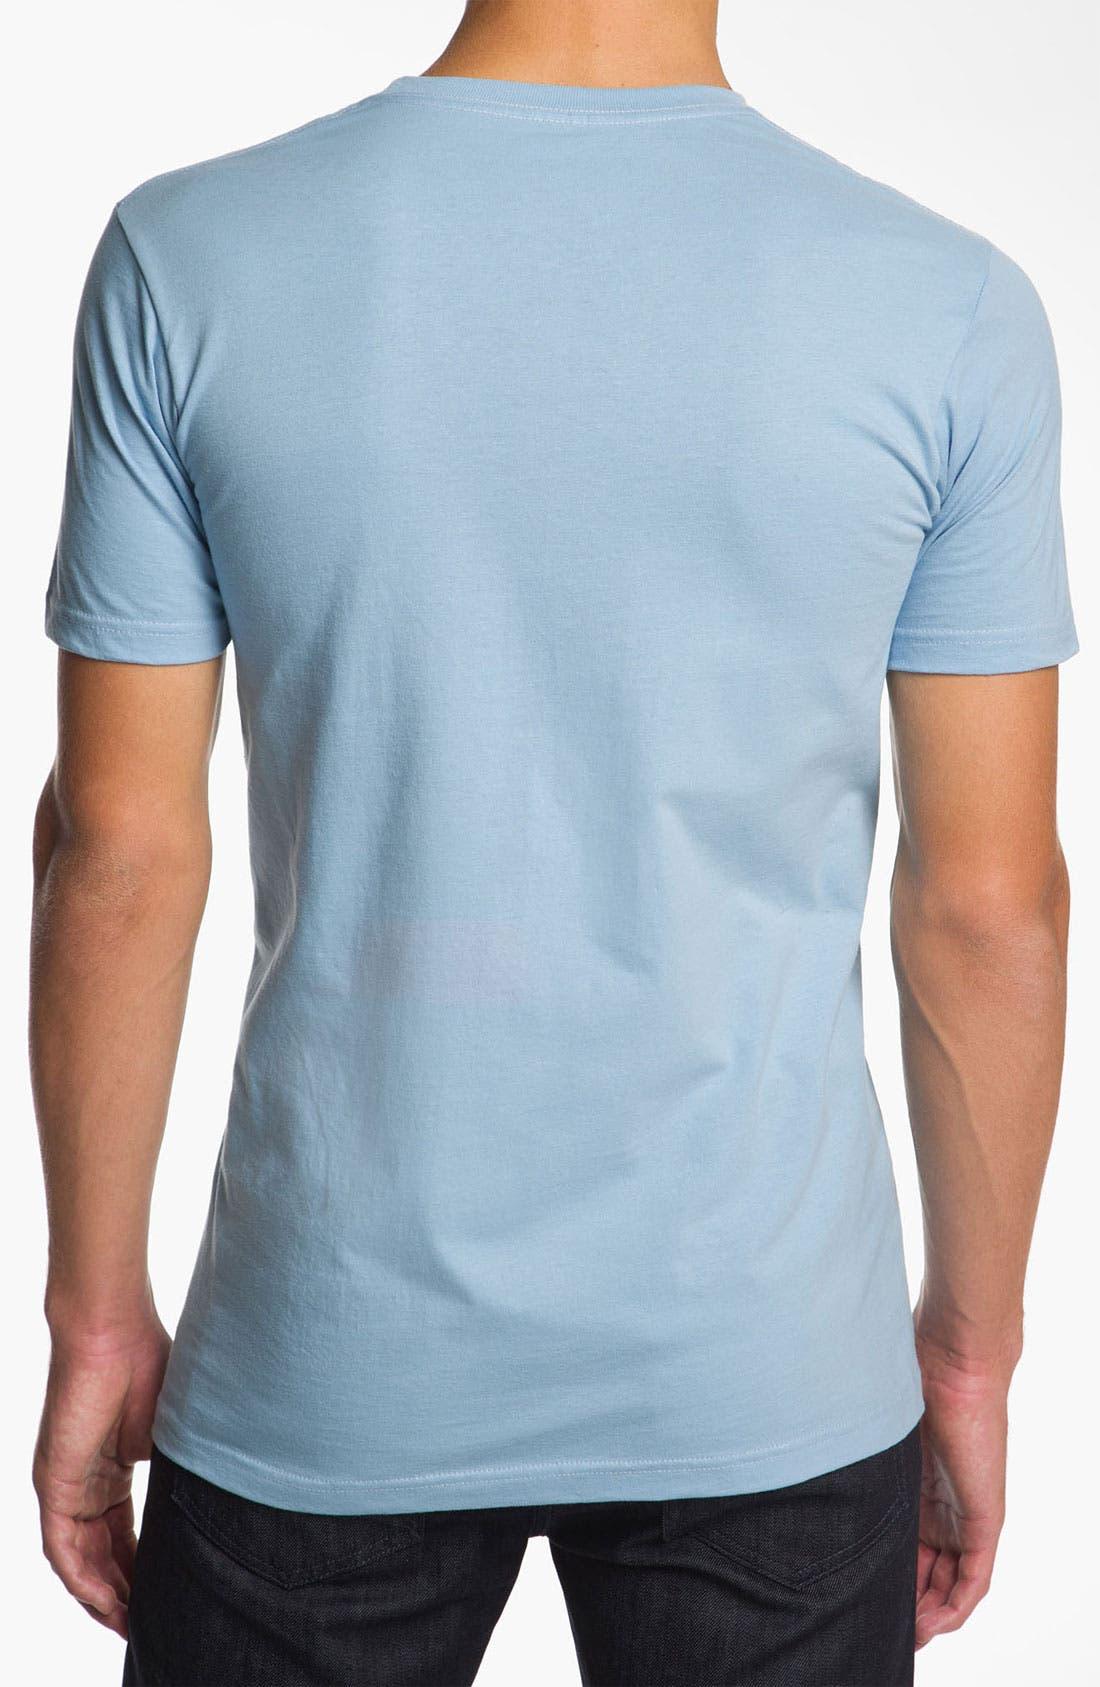 Alternate Image 2  - Ames Bros 'Brutus' Trim Fit Crewneck T-Shirt (Men)